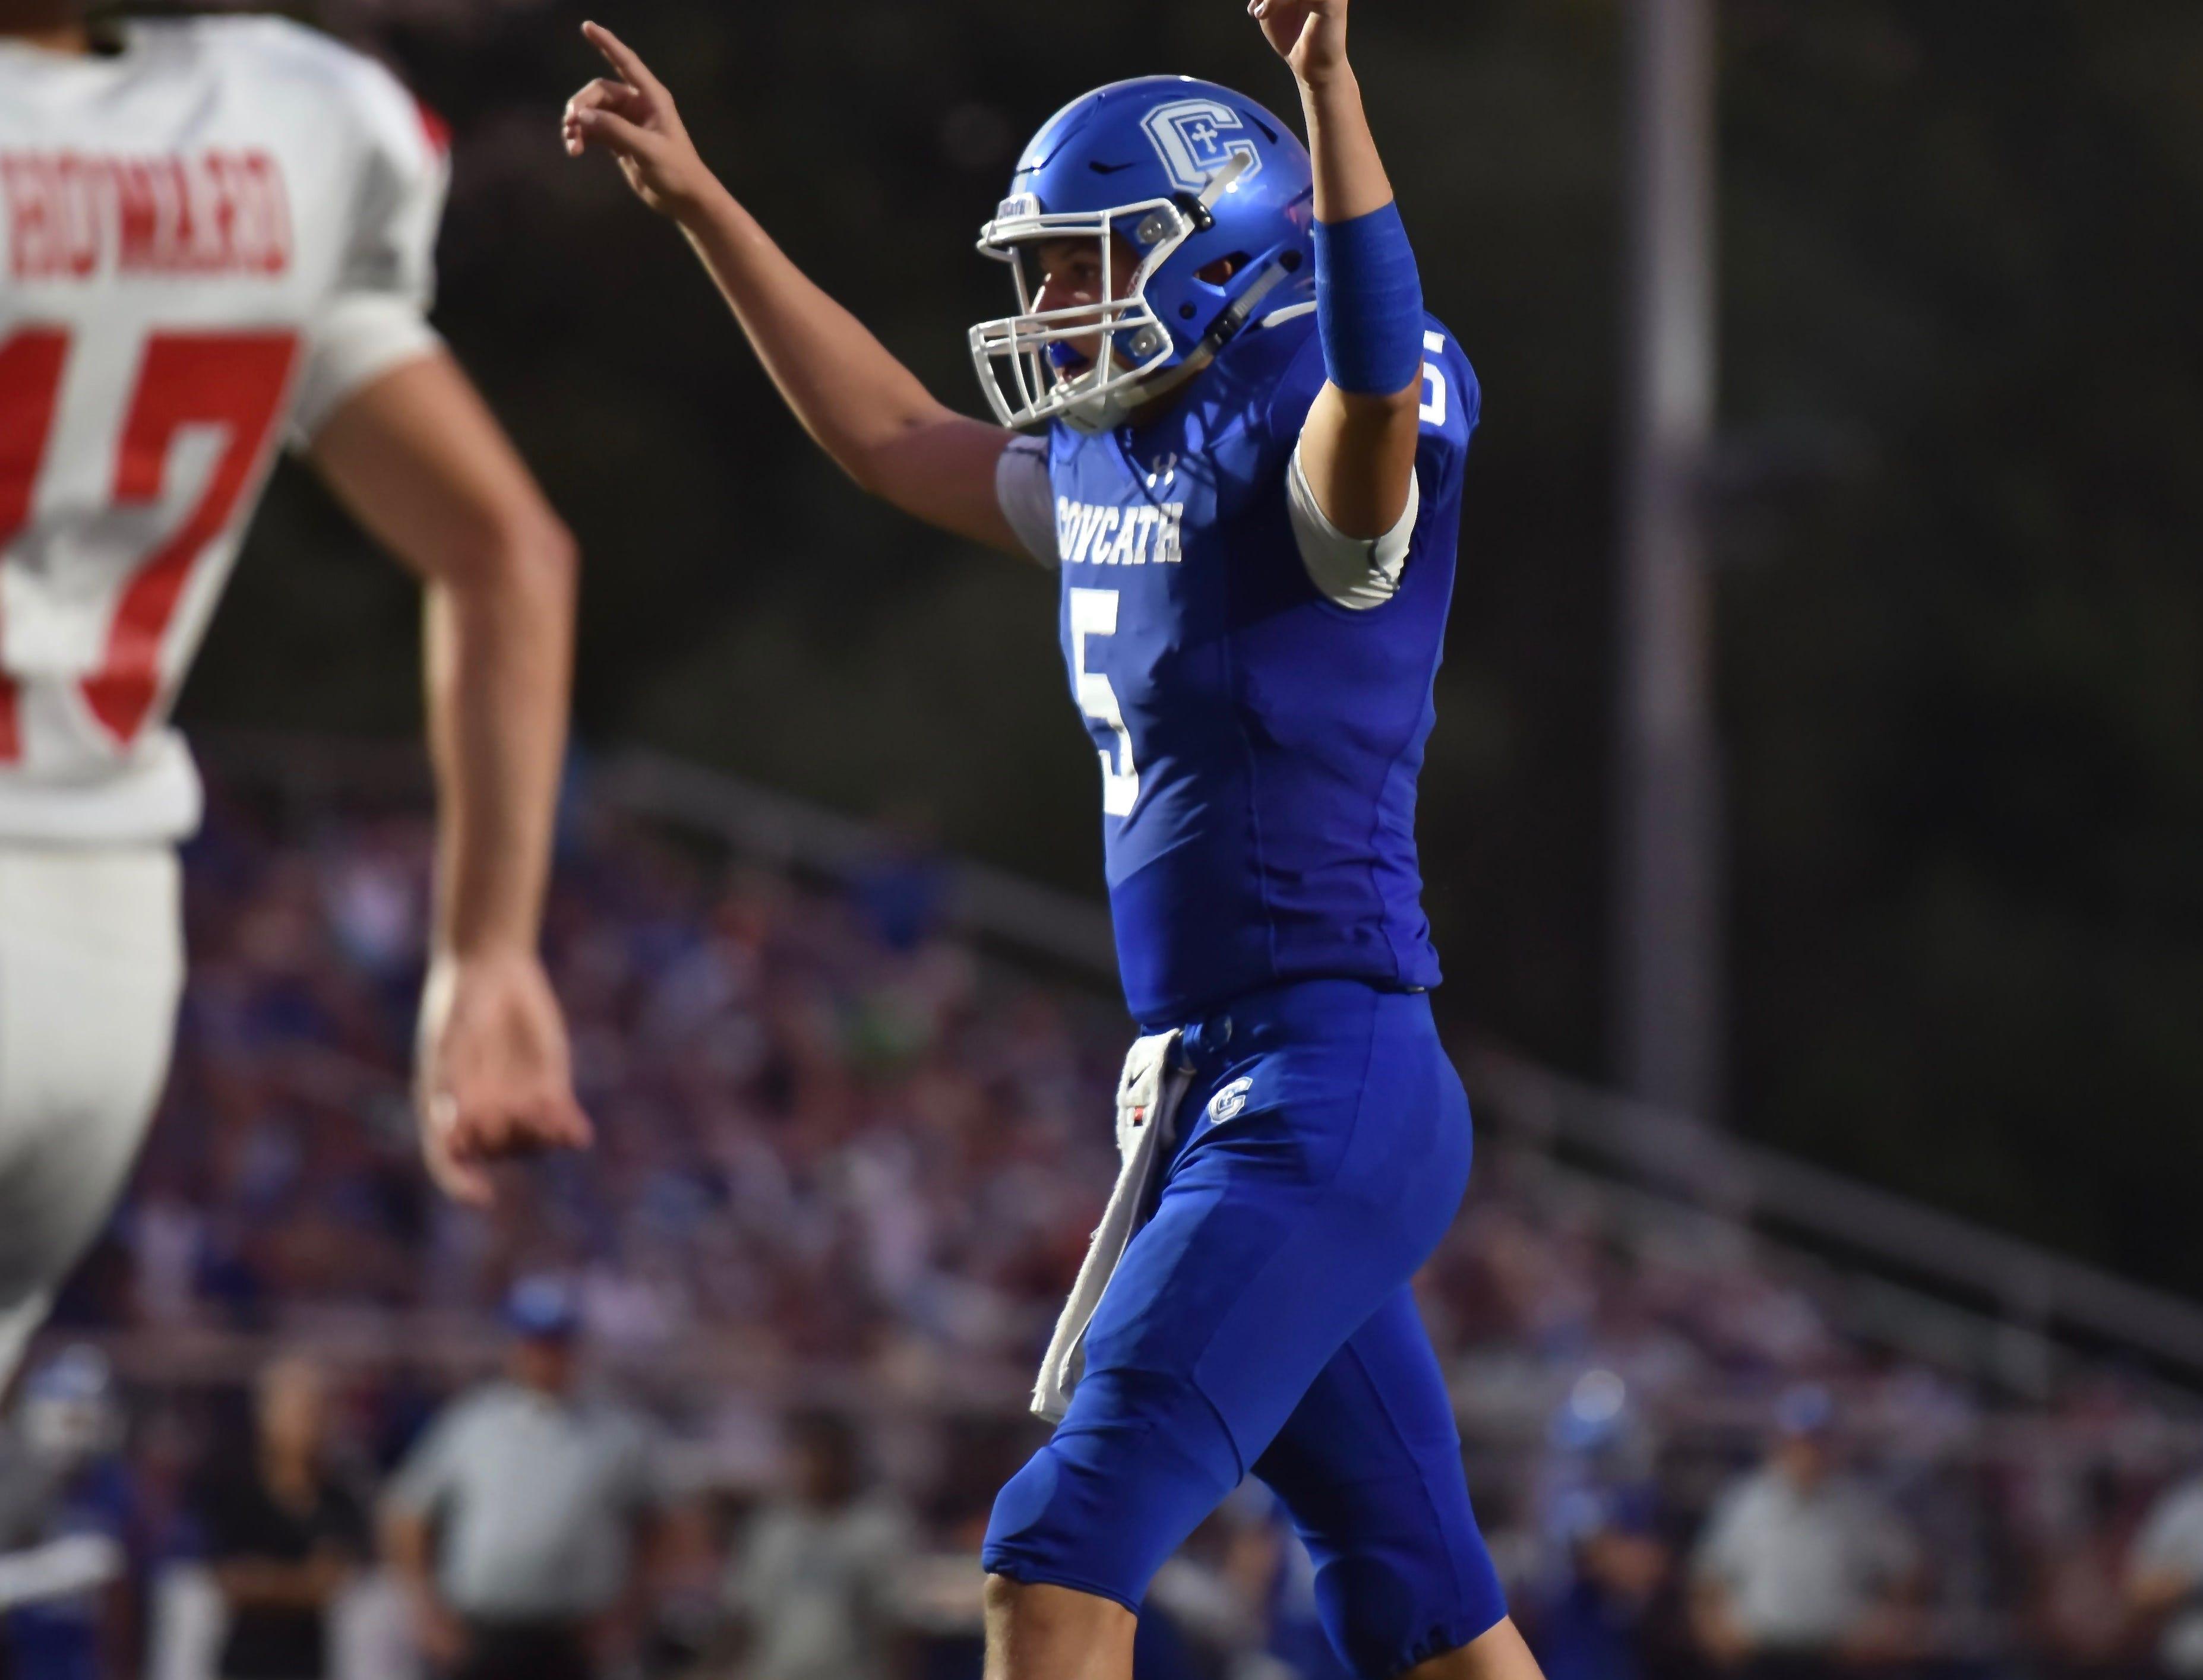 Covington Catholic's Caleb Jacob celebrates a touchdown against Beechwood Friday, Sept. 14, 2018.